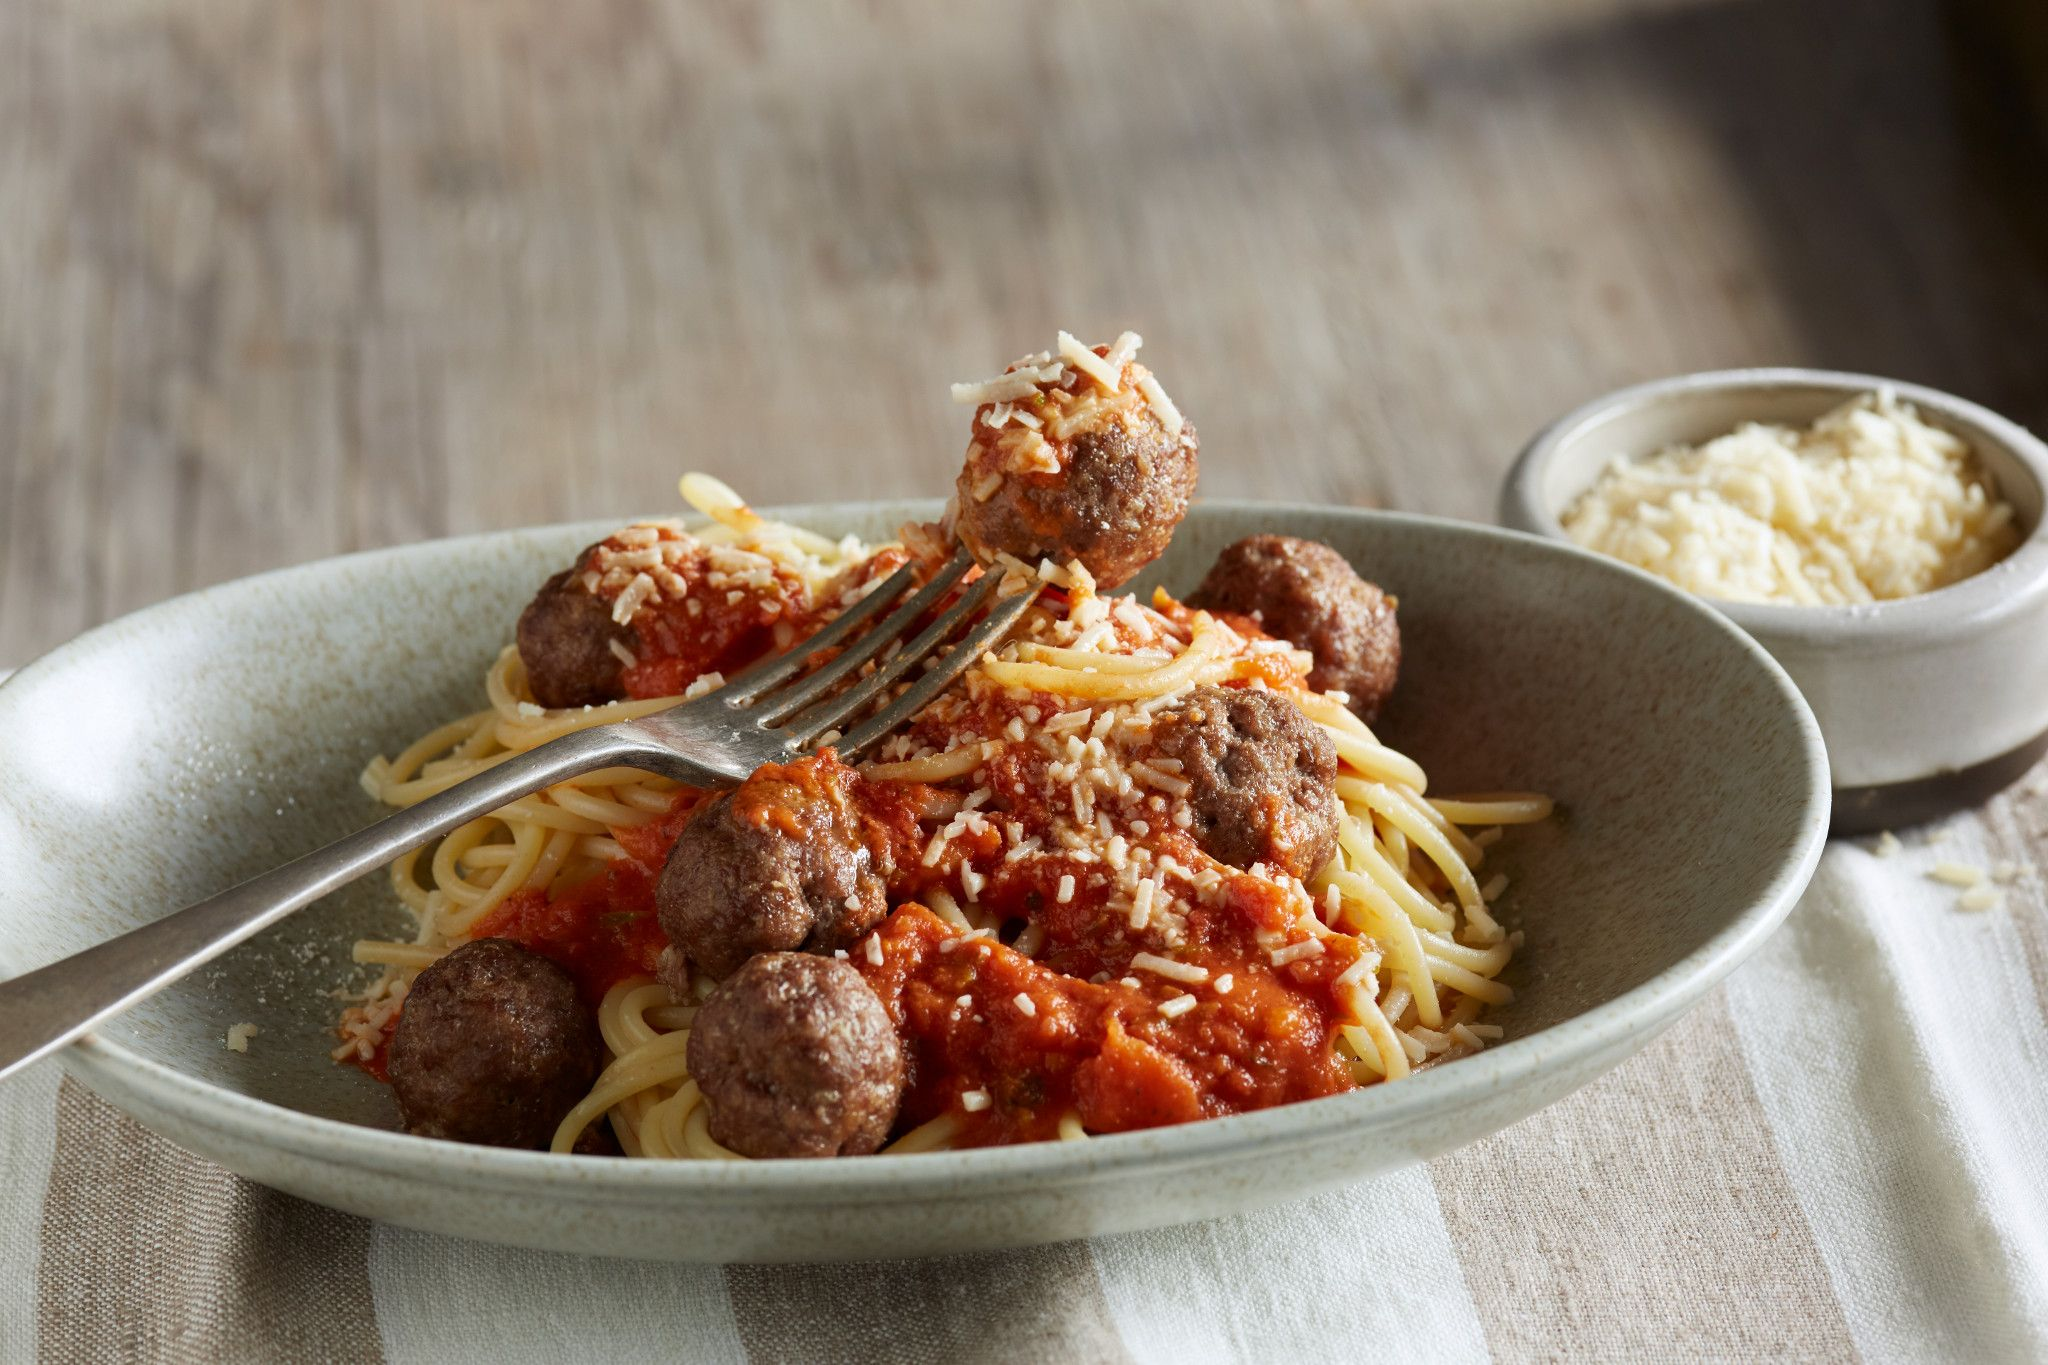 Spaghetti & Savory Meatballs